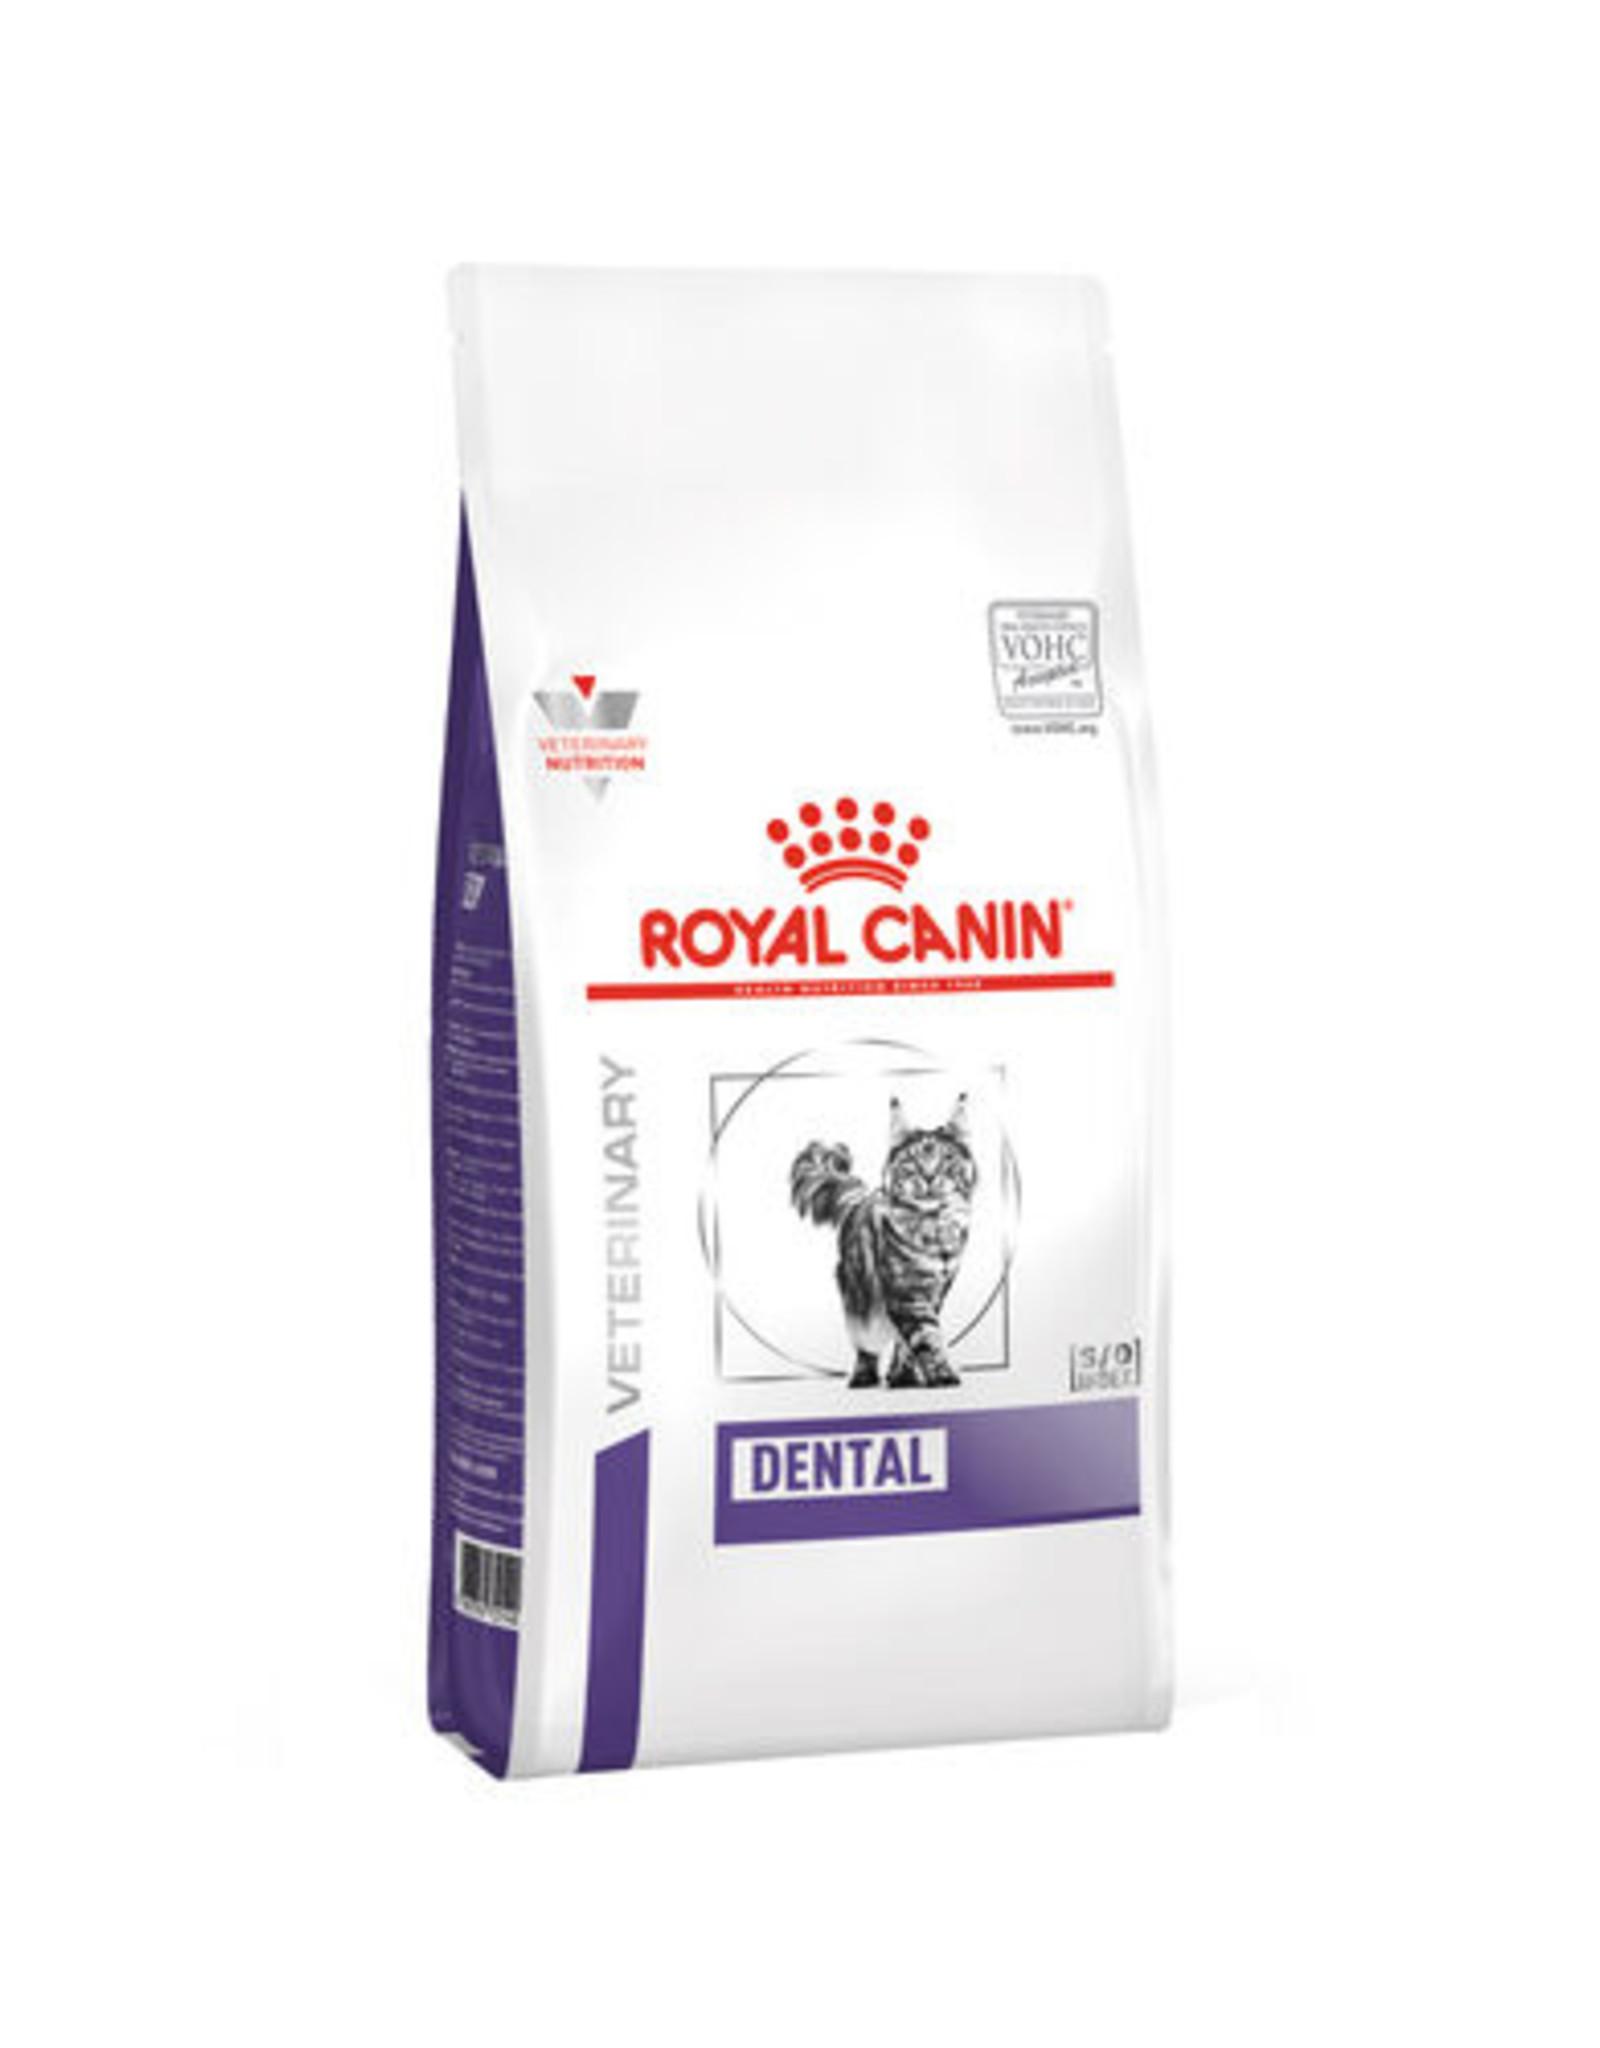 Royal Canin Royal Canin Vdiet Dental Kat 3kg